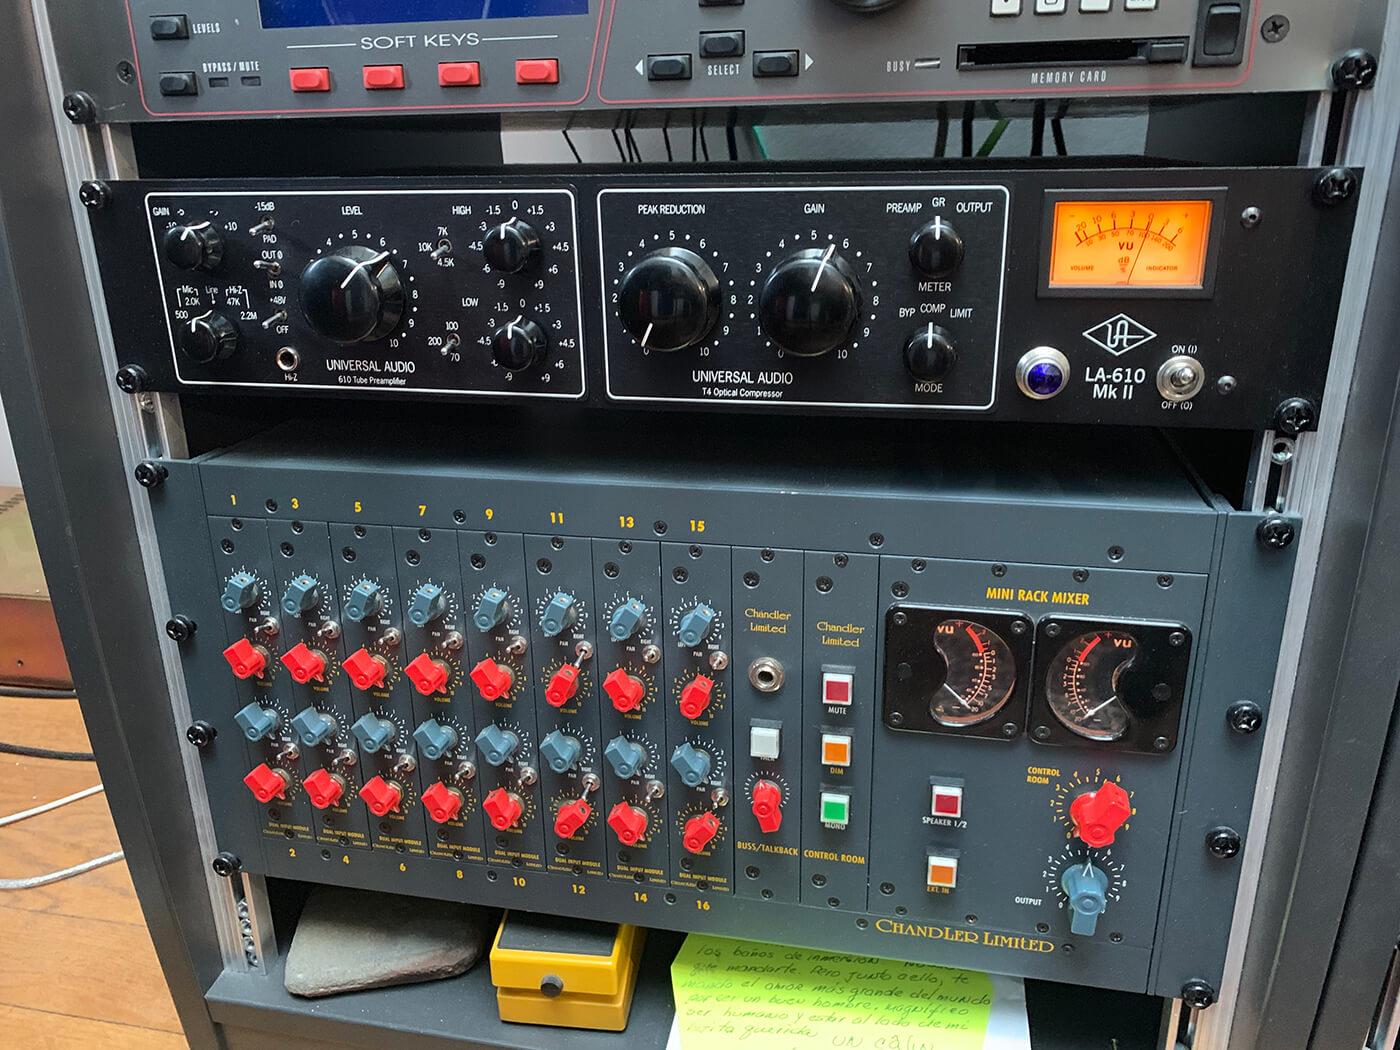 Rodriguez Jr's Roland TB-303 Rack